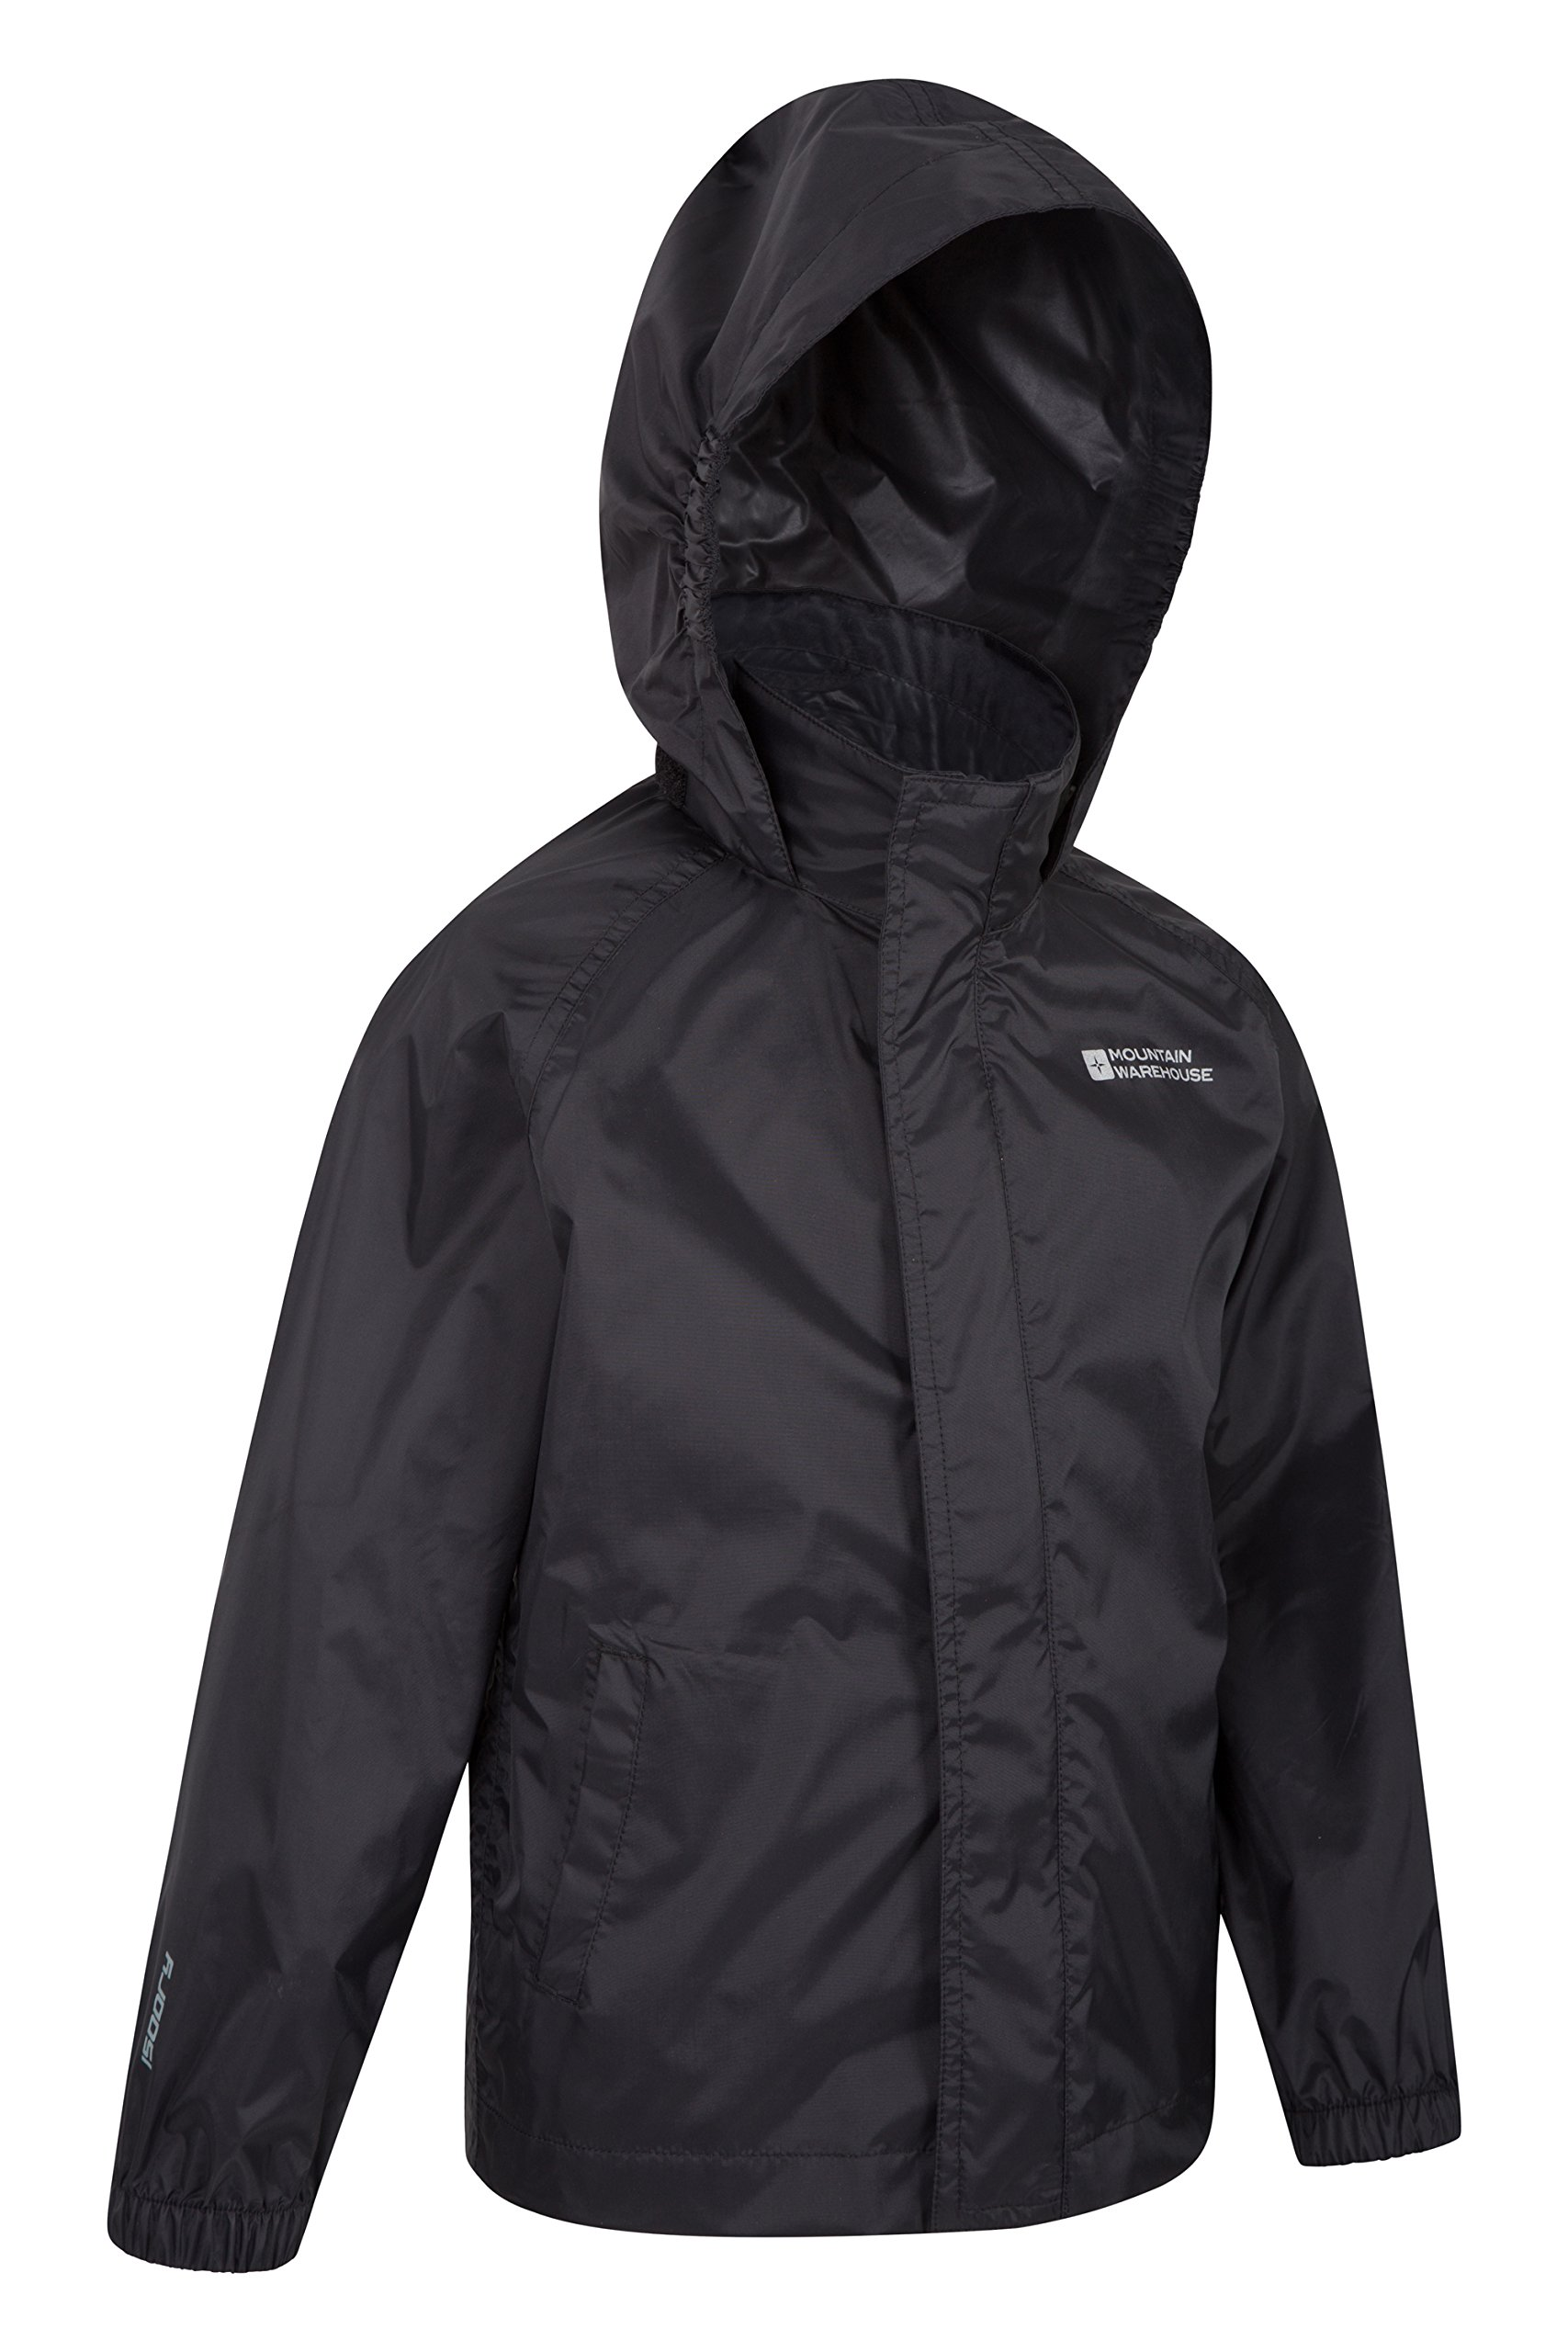 12bc0d530 Galleon - Mountain Warehouse Pakka Kids Rain Jacket - Waterproof - Girls &  Boys Black 3-4 Years